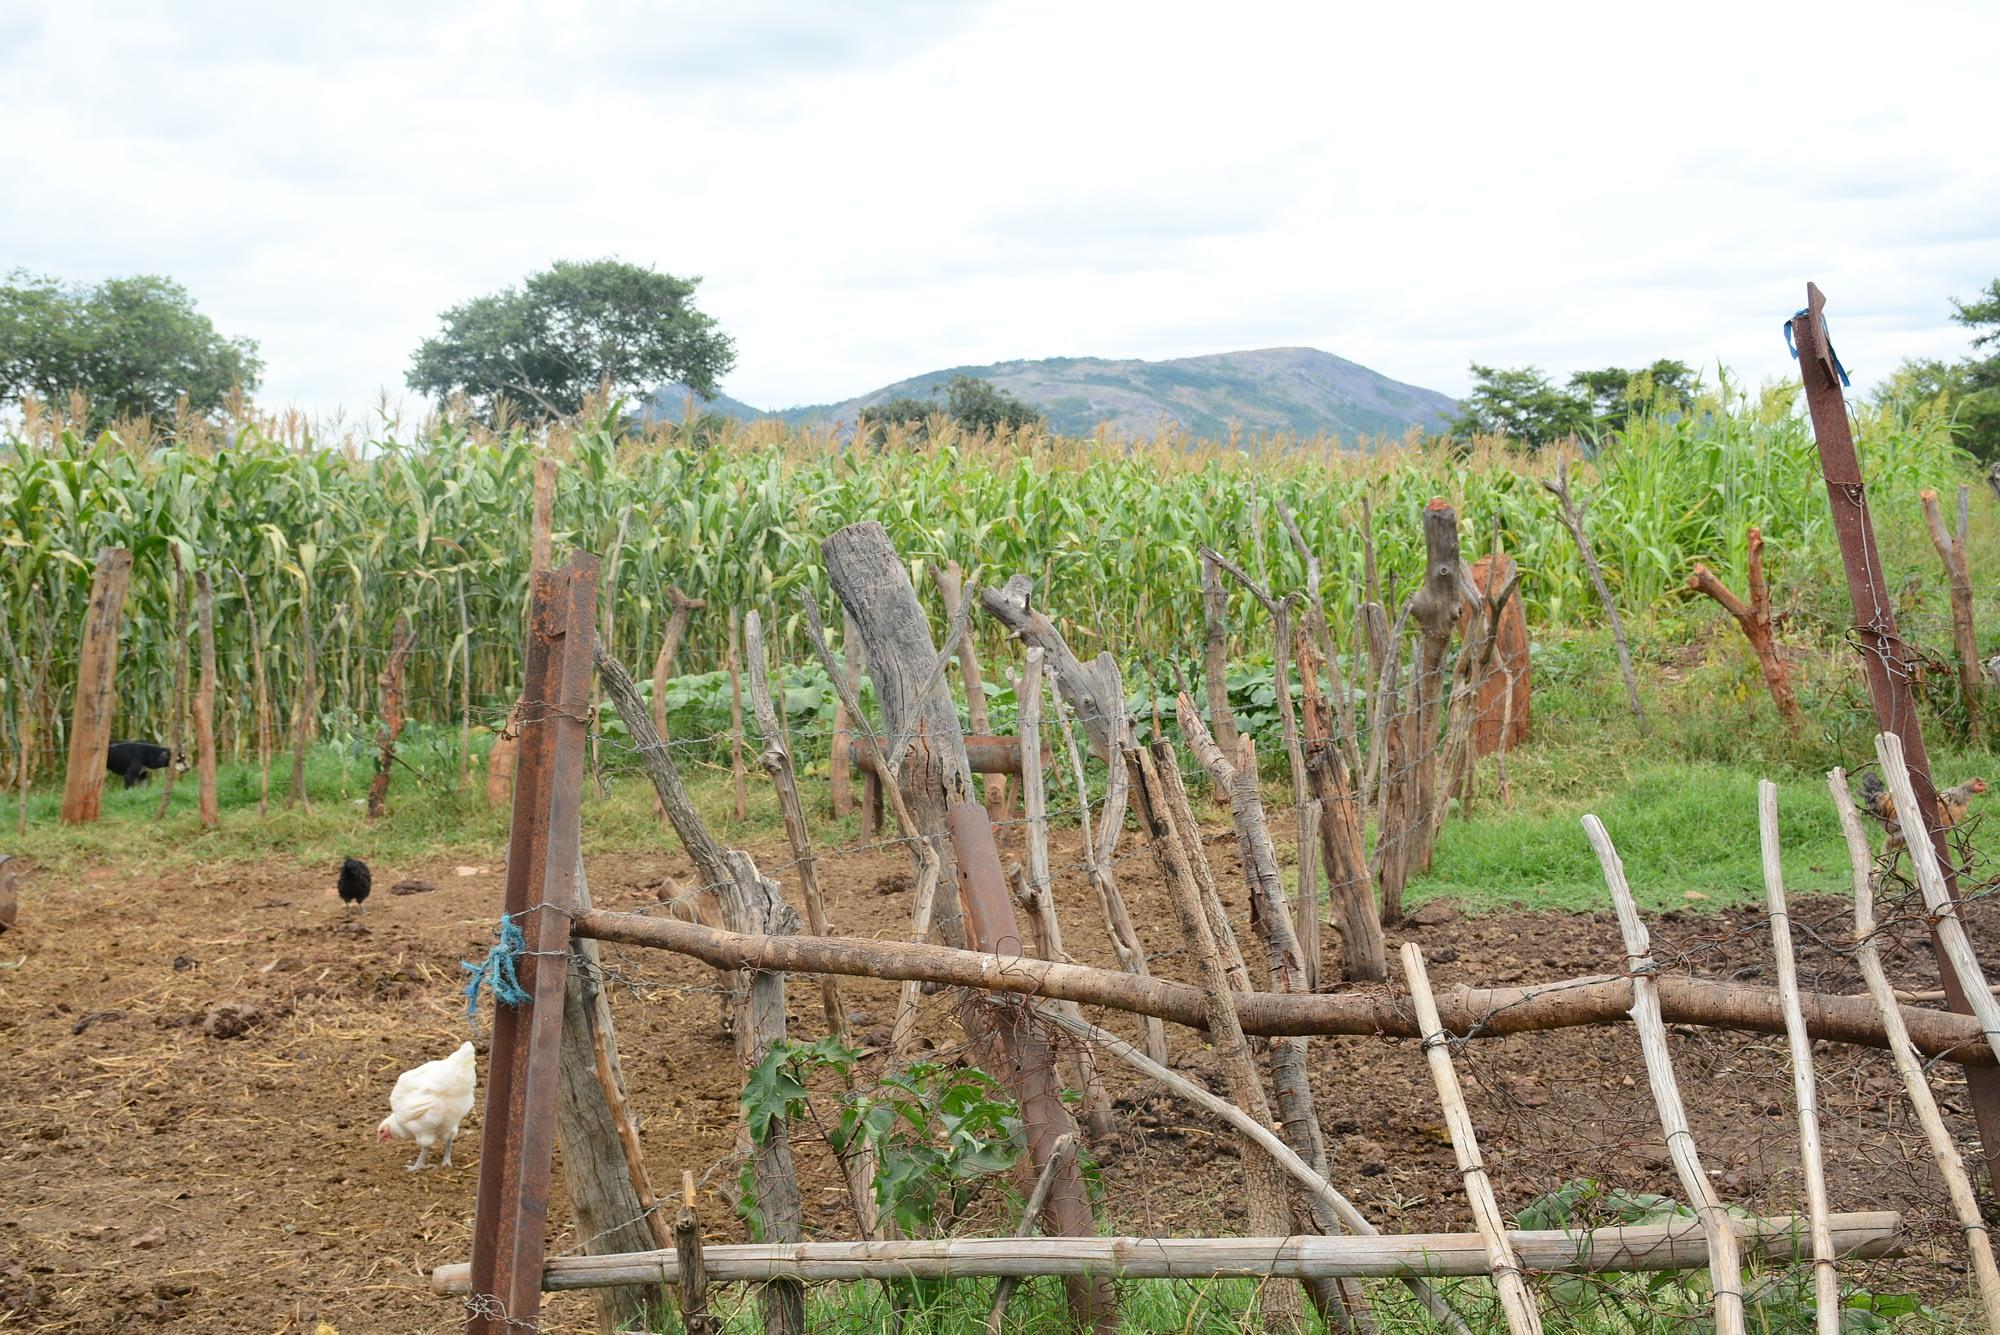 Cattle fattening pens at Cosmas and Netsai Garwe's homestead. (Photo: Shiela Chikulo/CIMMYT)